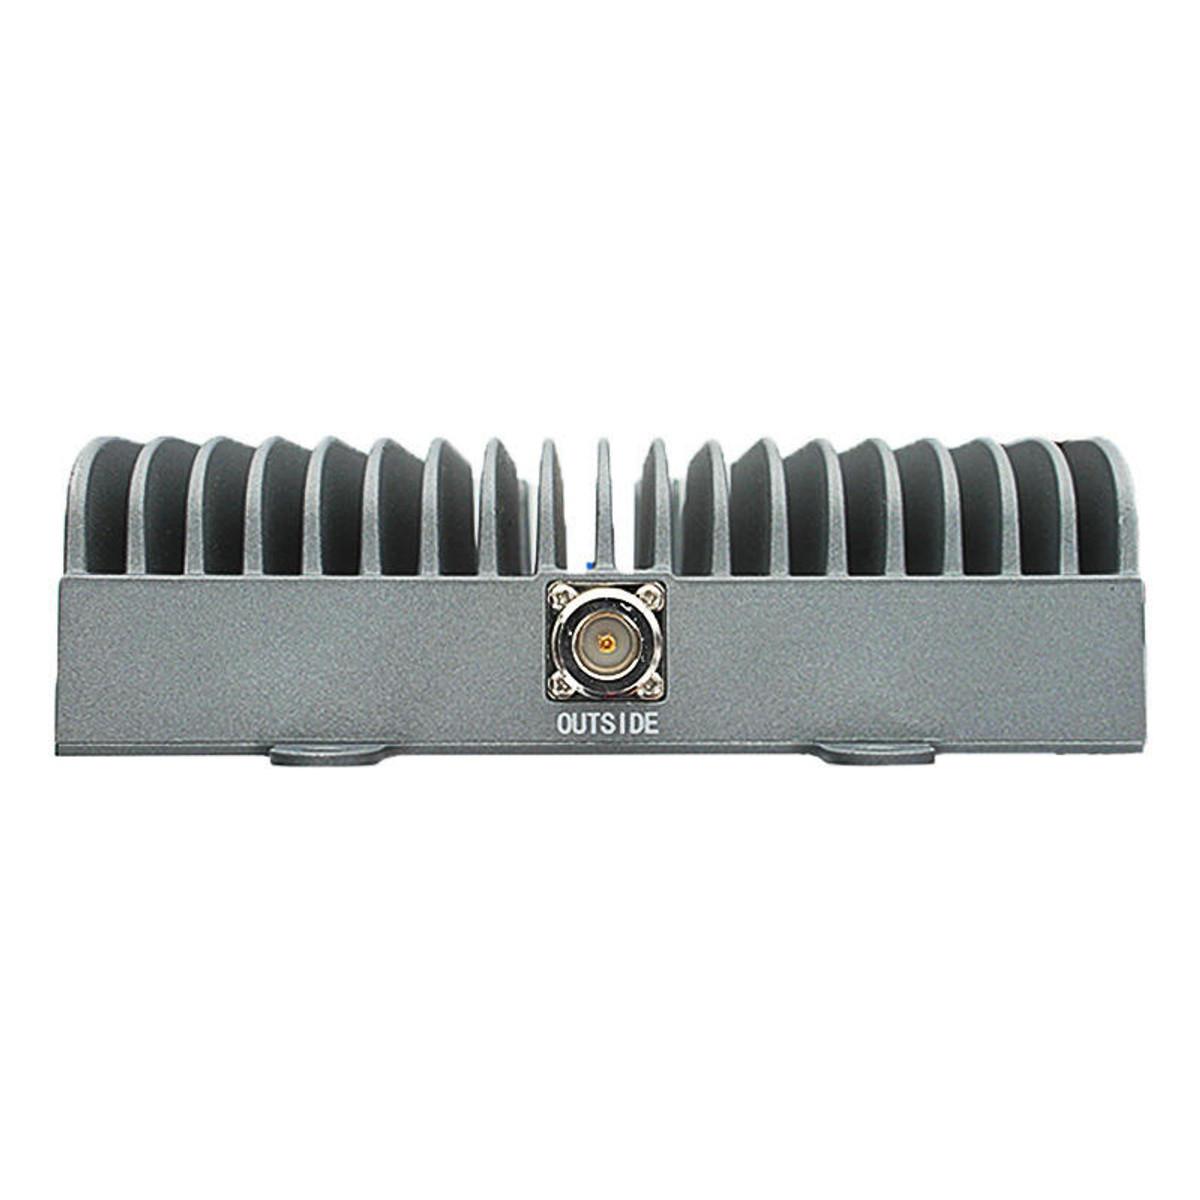 SureCall SureCall Fusion5s 2.0 Signal Booster Kit